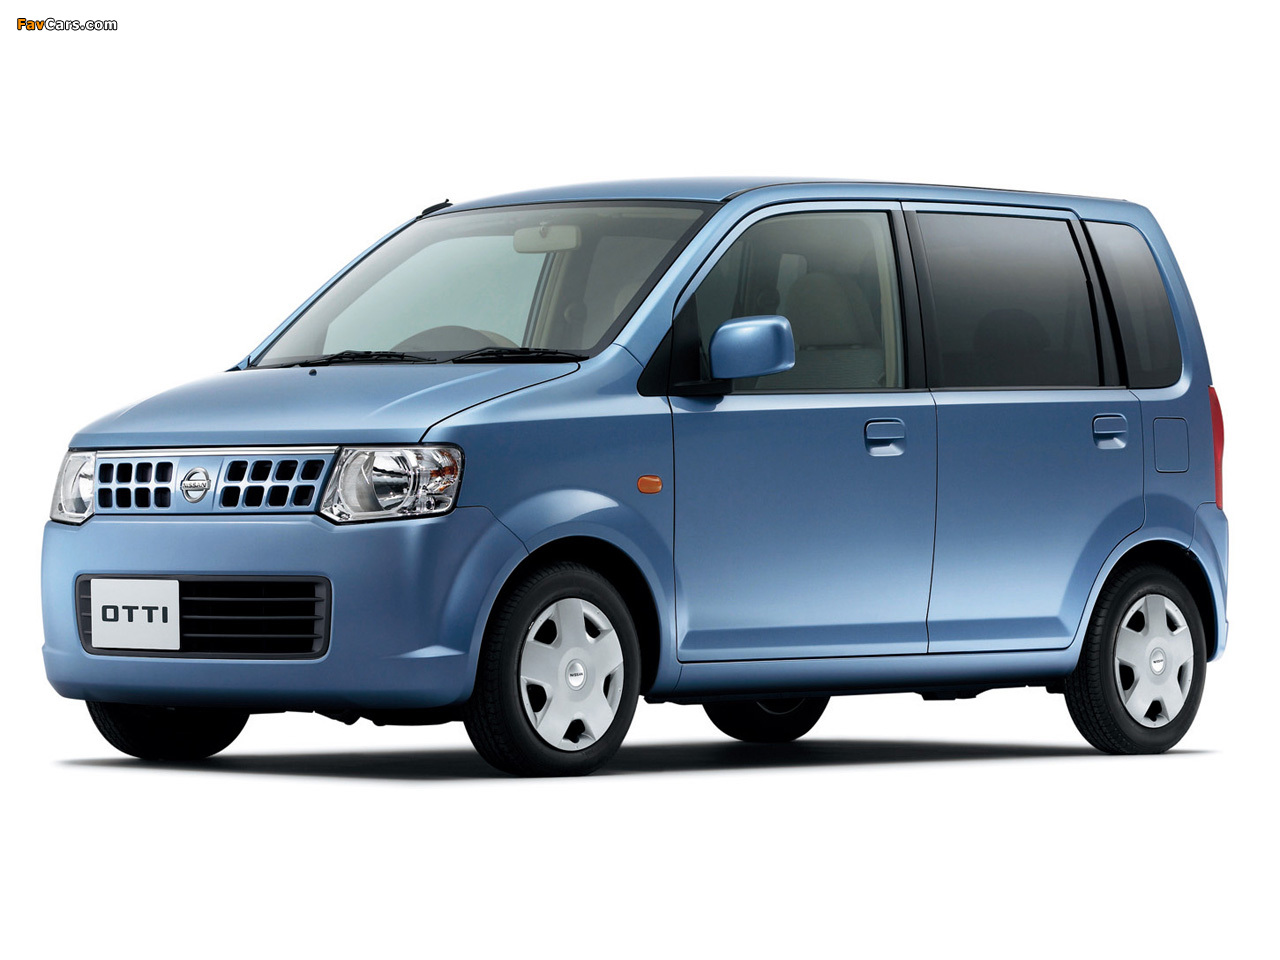 Nissan Otti (H92W) 2006 images (1280 x 960)